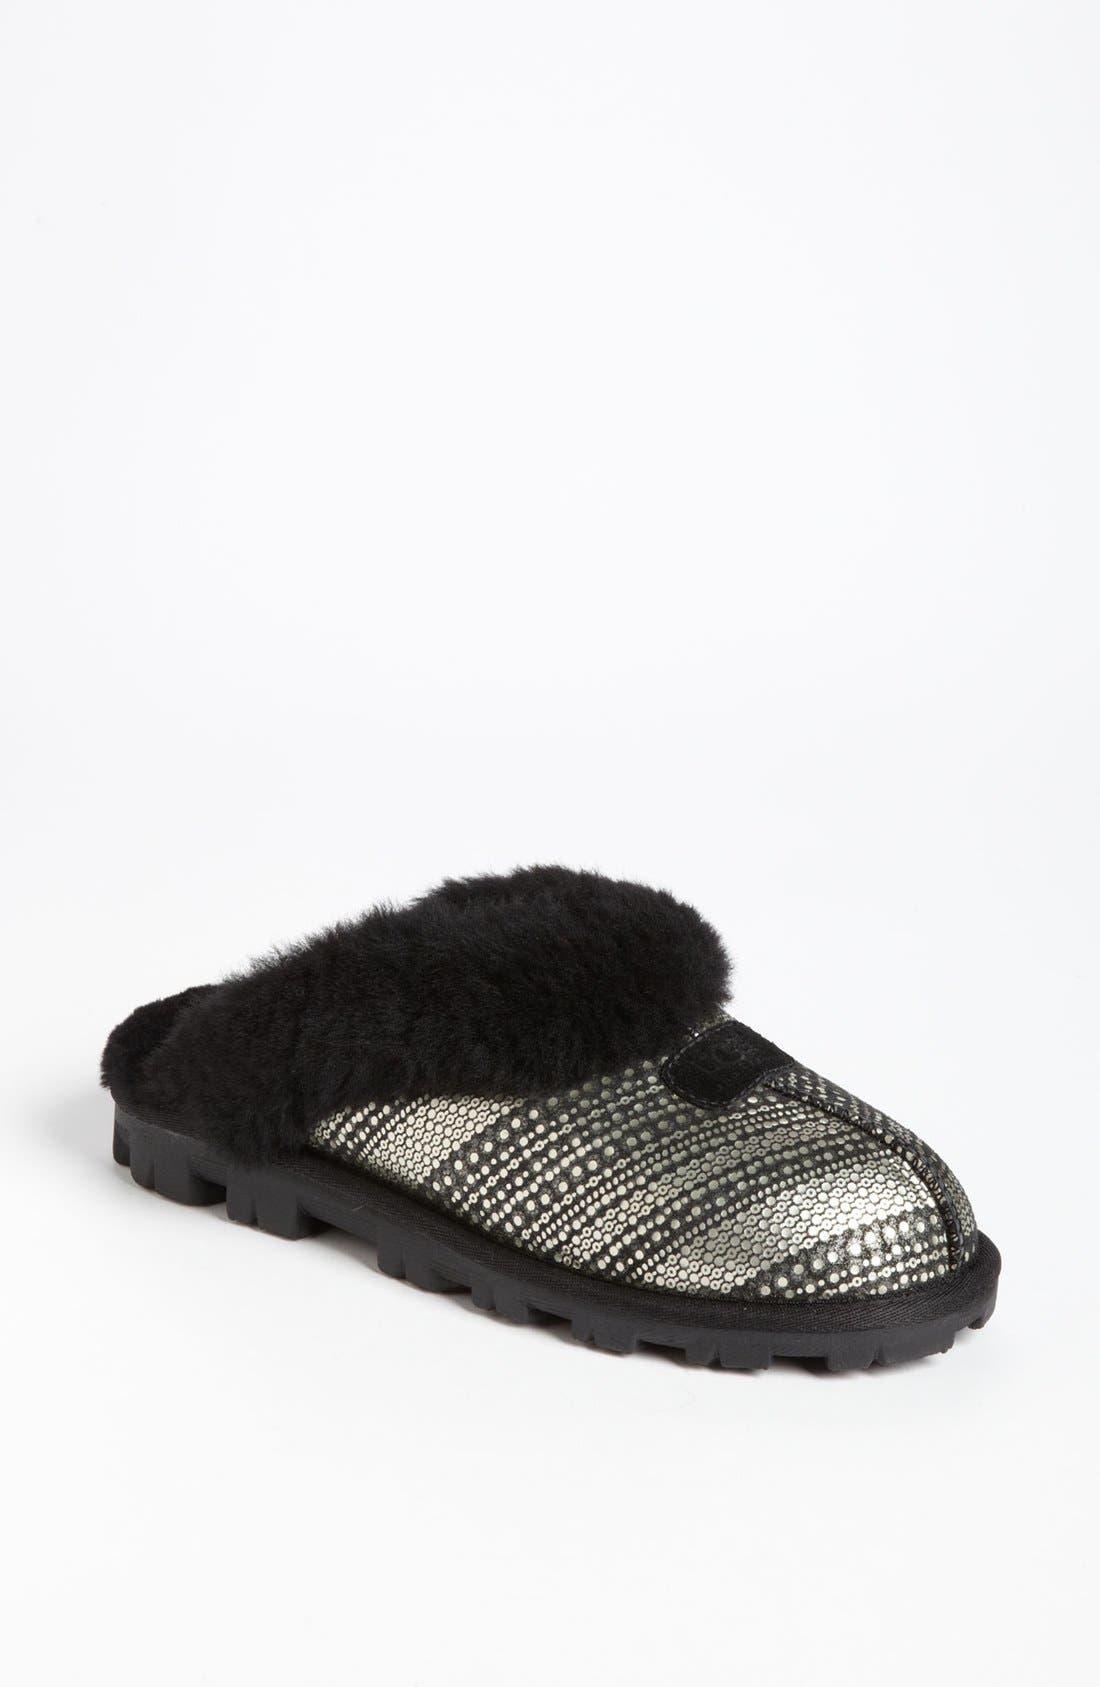 Main Image - UGG® Australia 'Coquette' Slipper (Women)